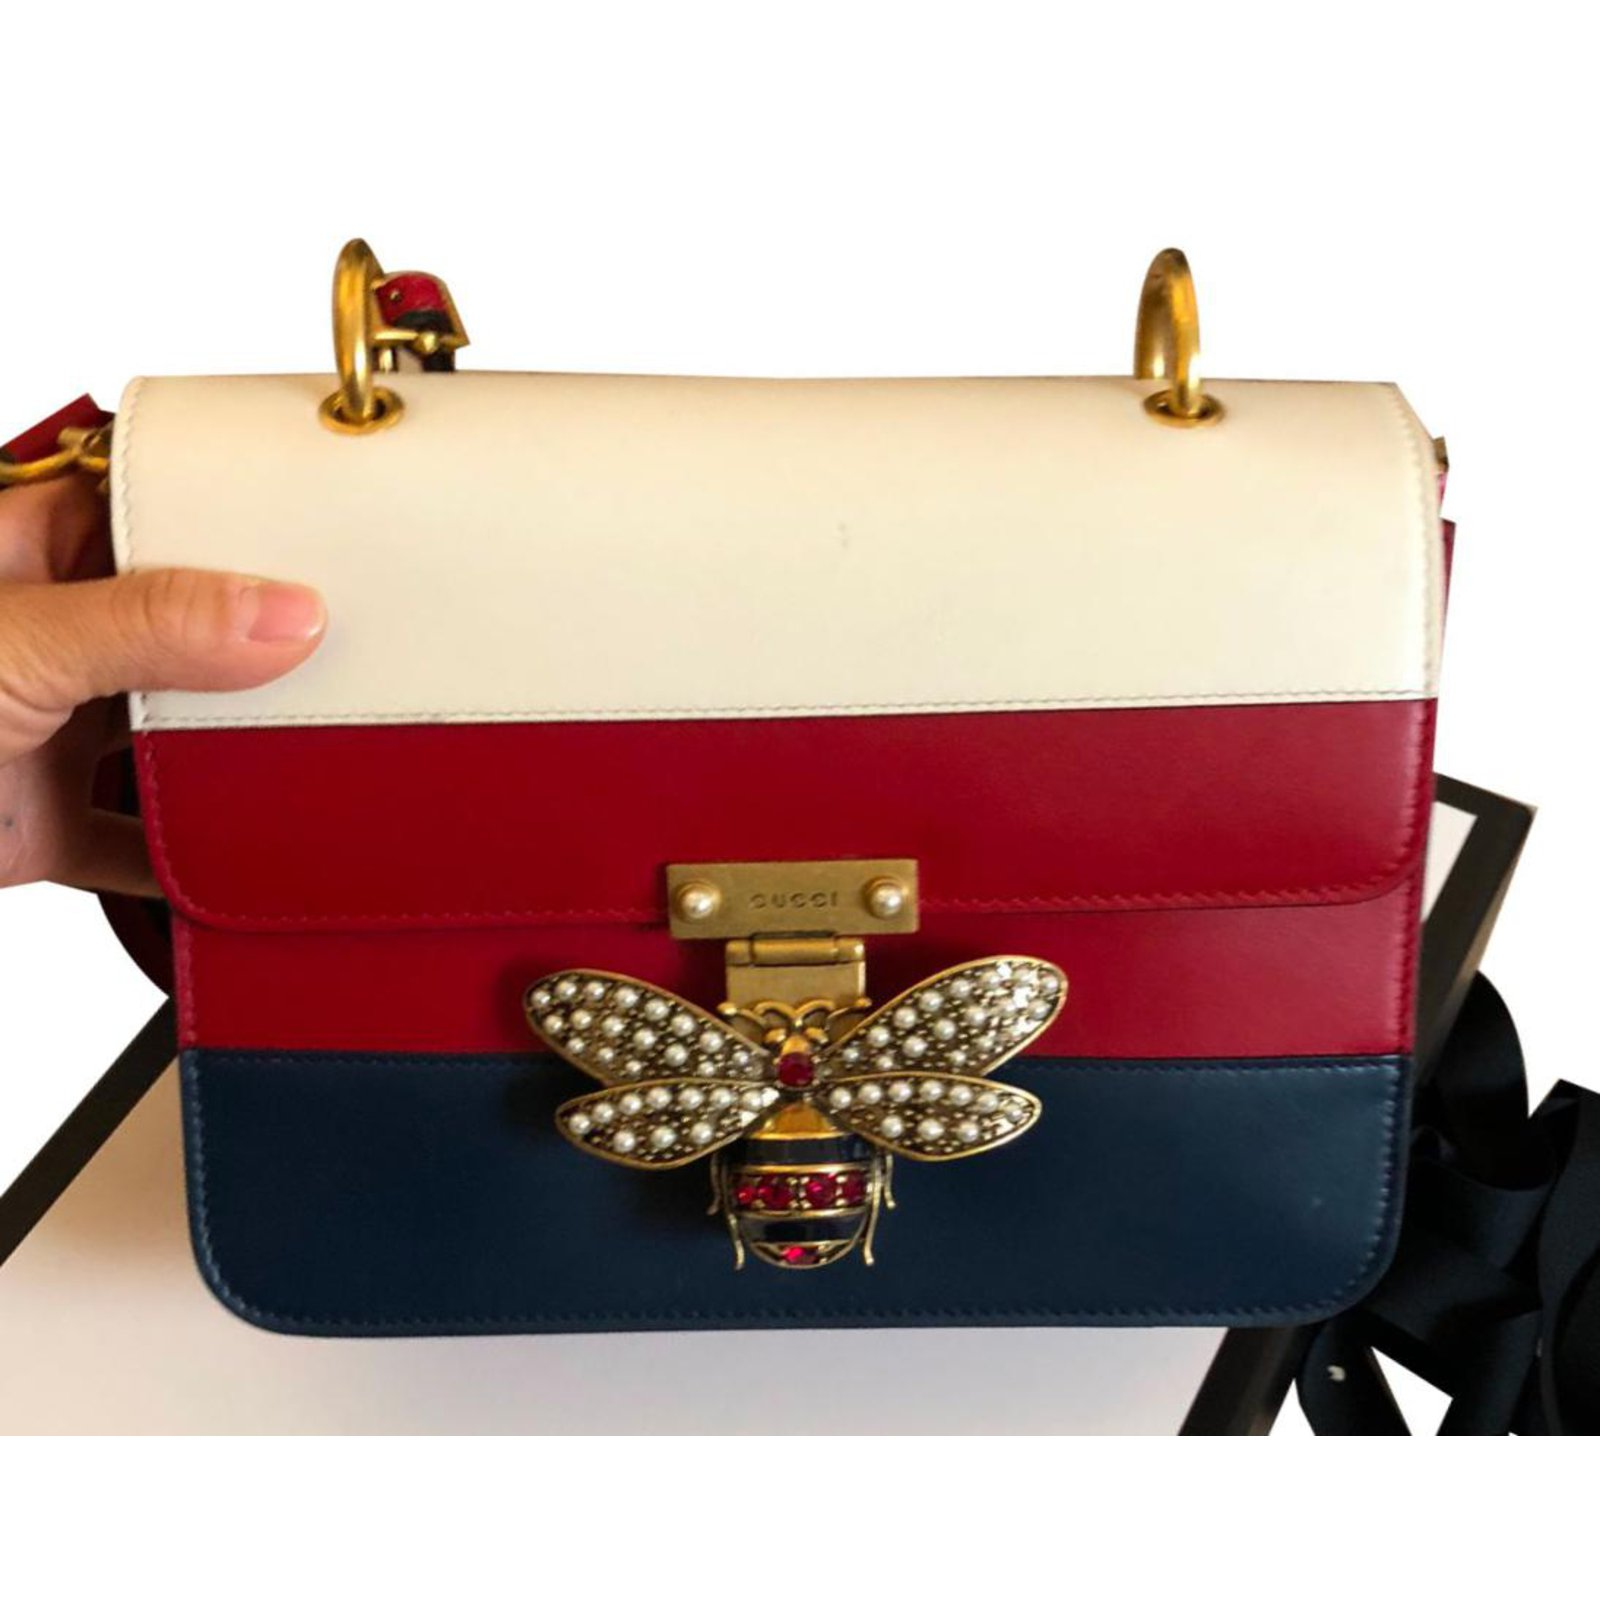 290e721229a Cabas gucci sac bandoulière cuir blanc rouge bleu ref joli jpg 1600x1600 Sac  gucci